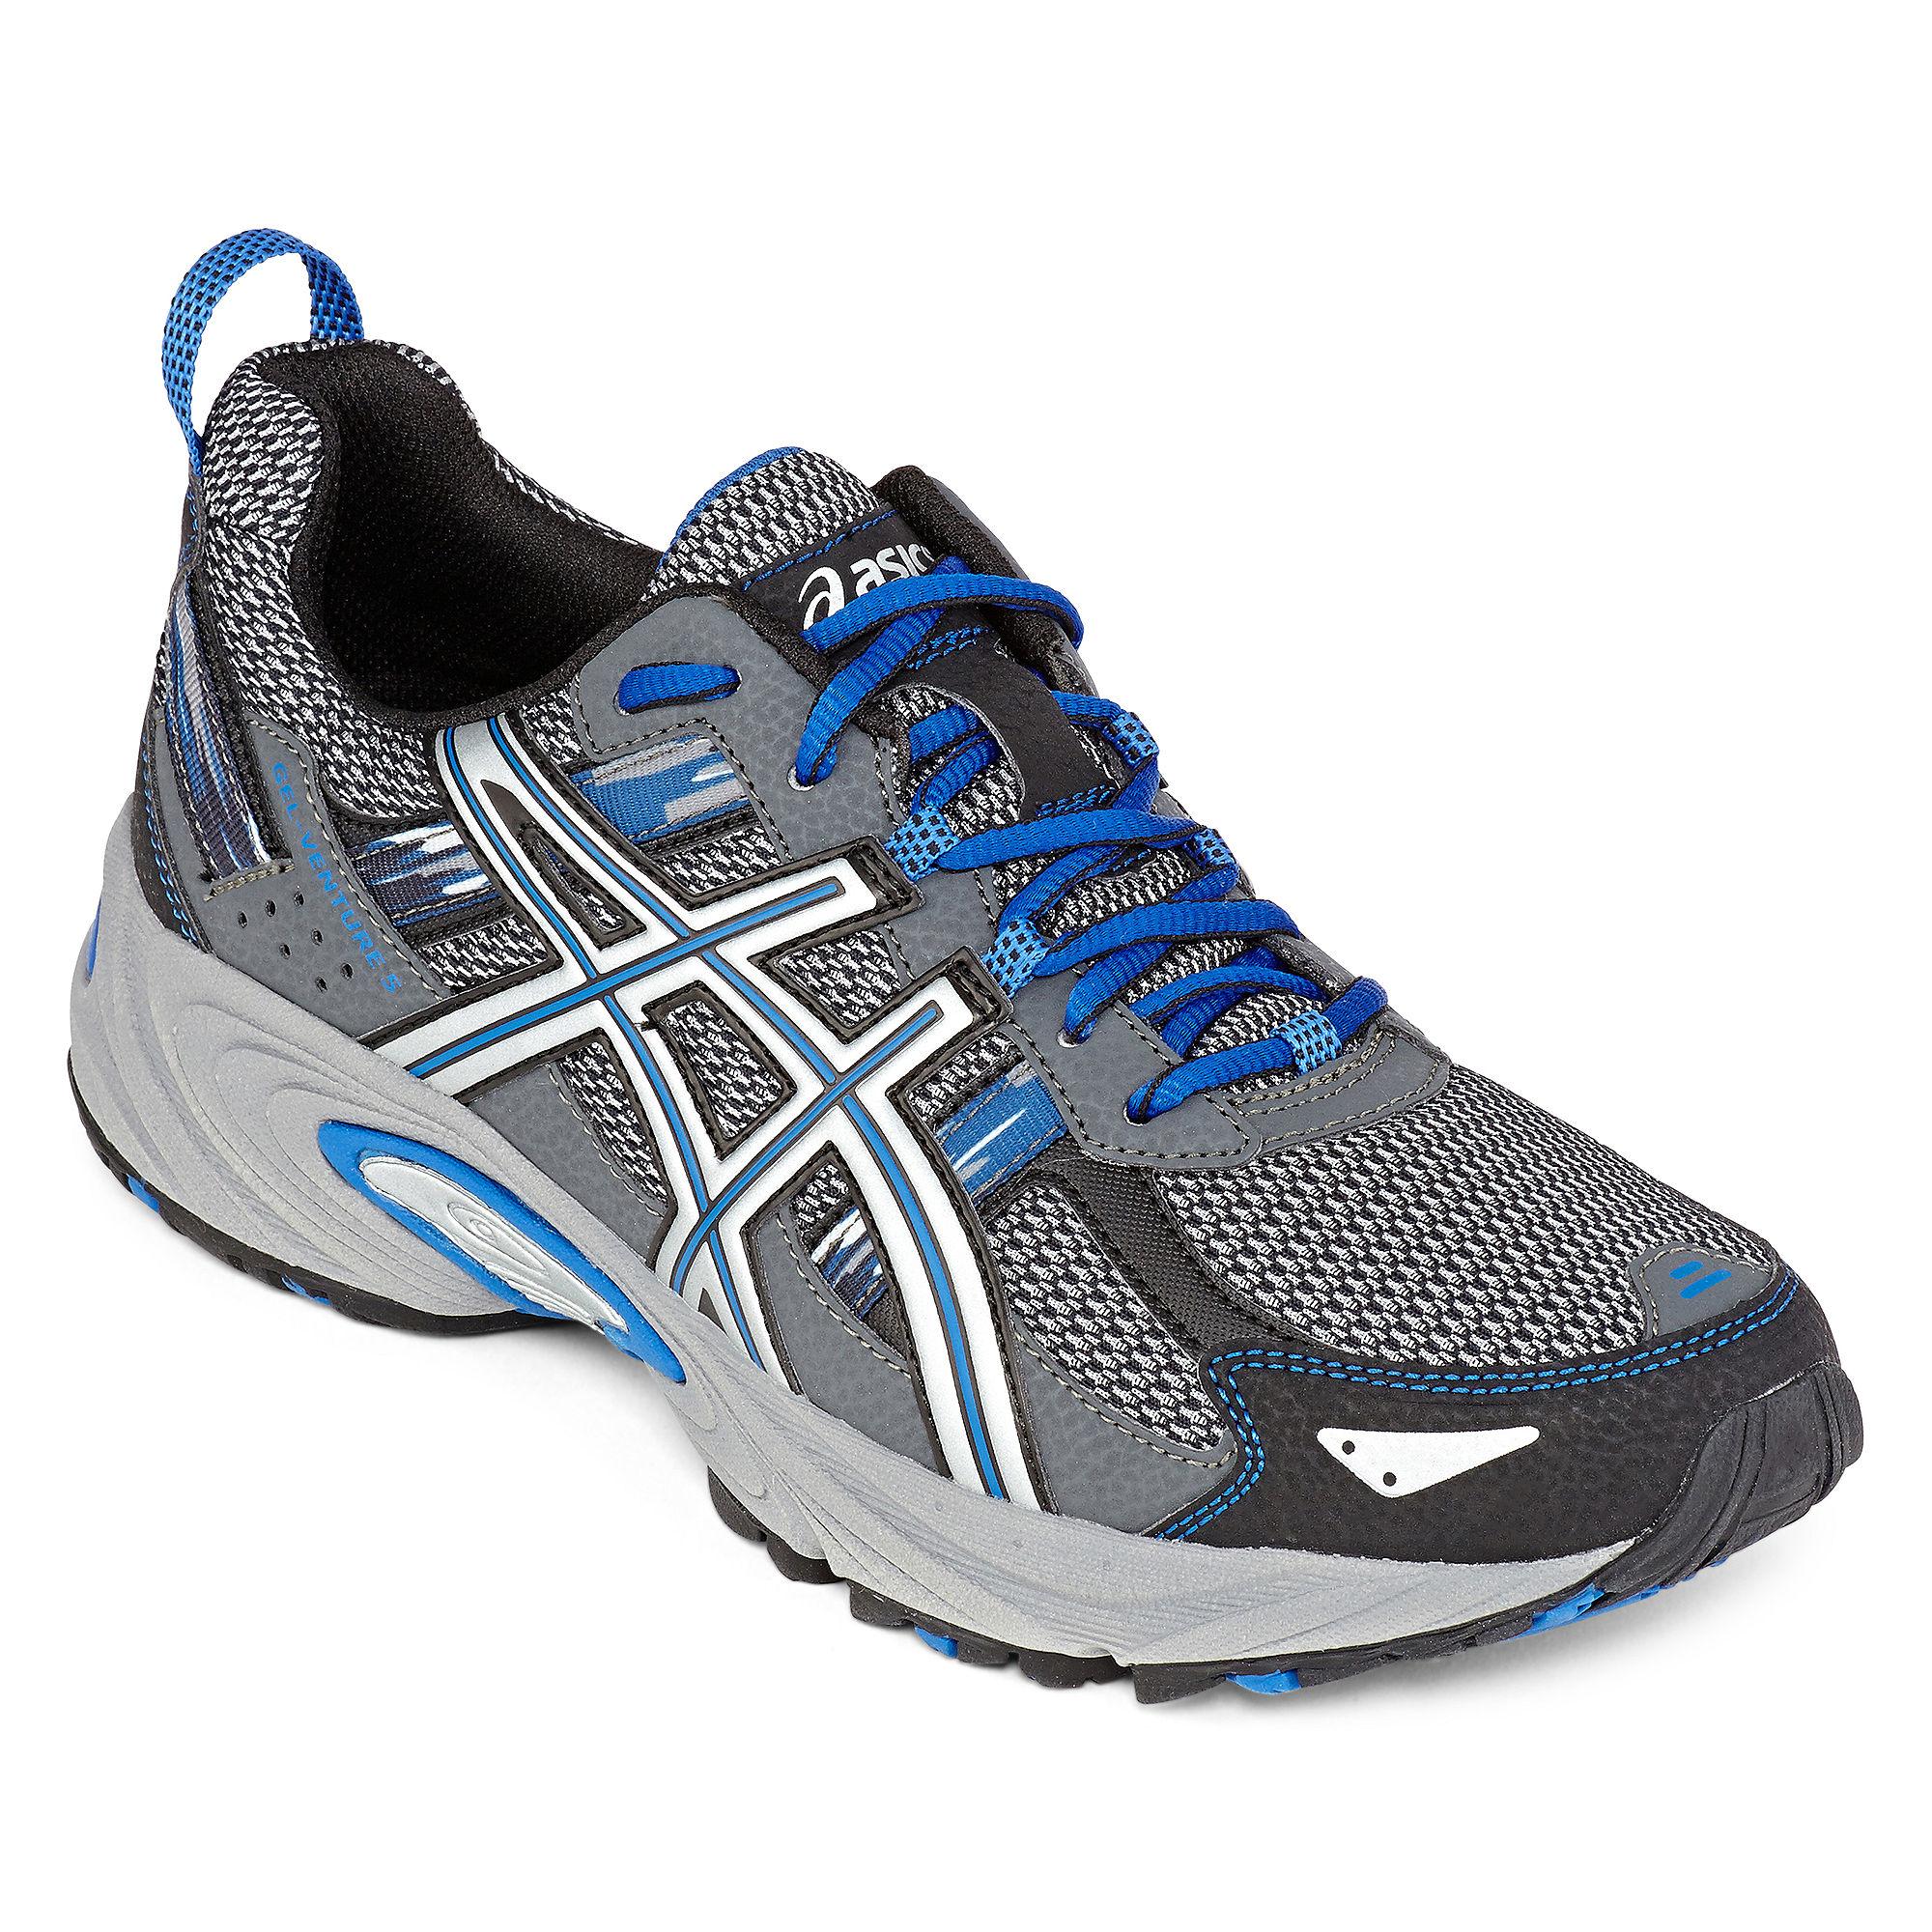 ASICS GEL-Venture 5 Mens Running Shoes